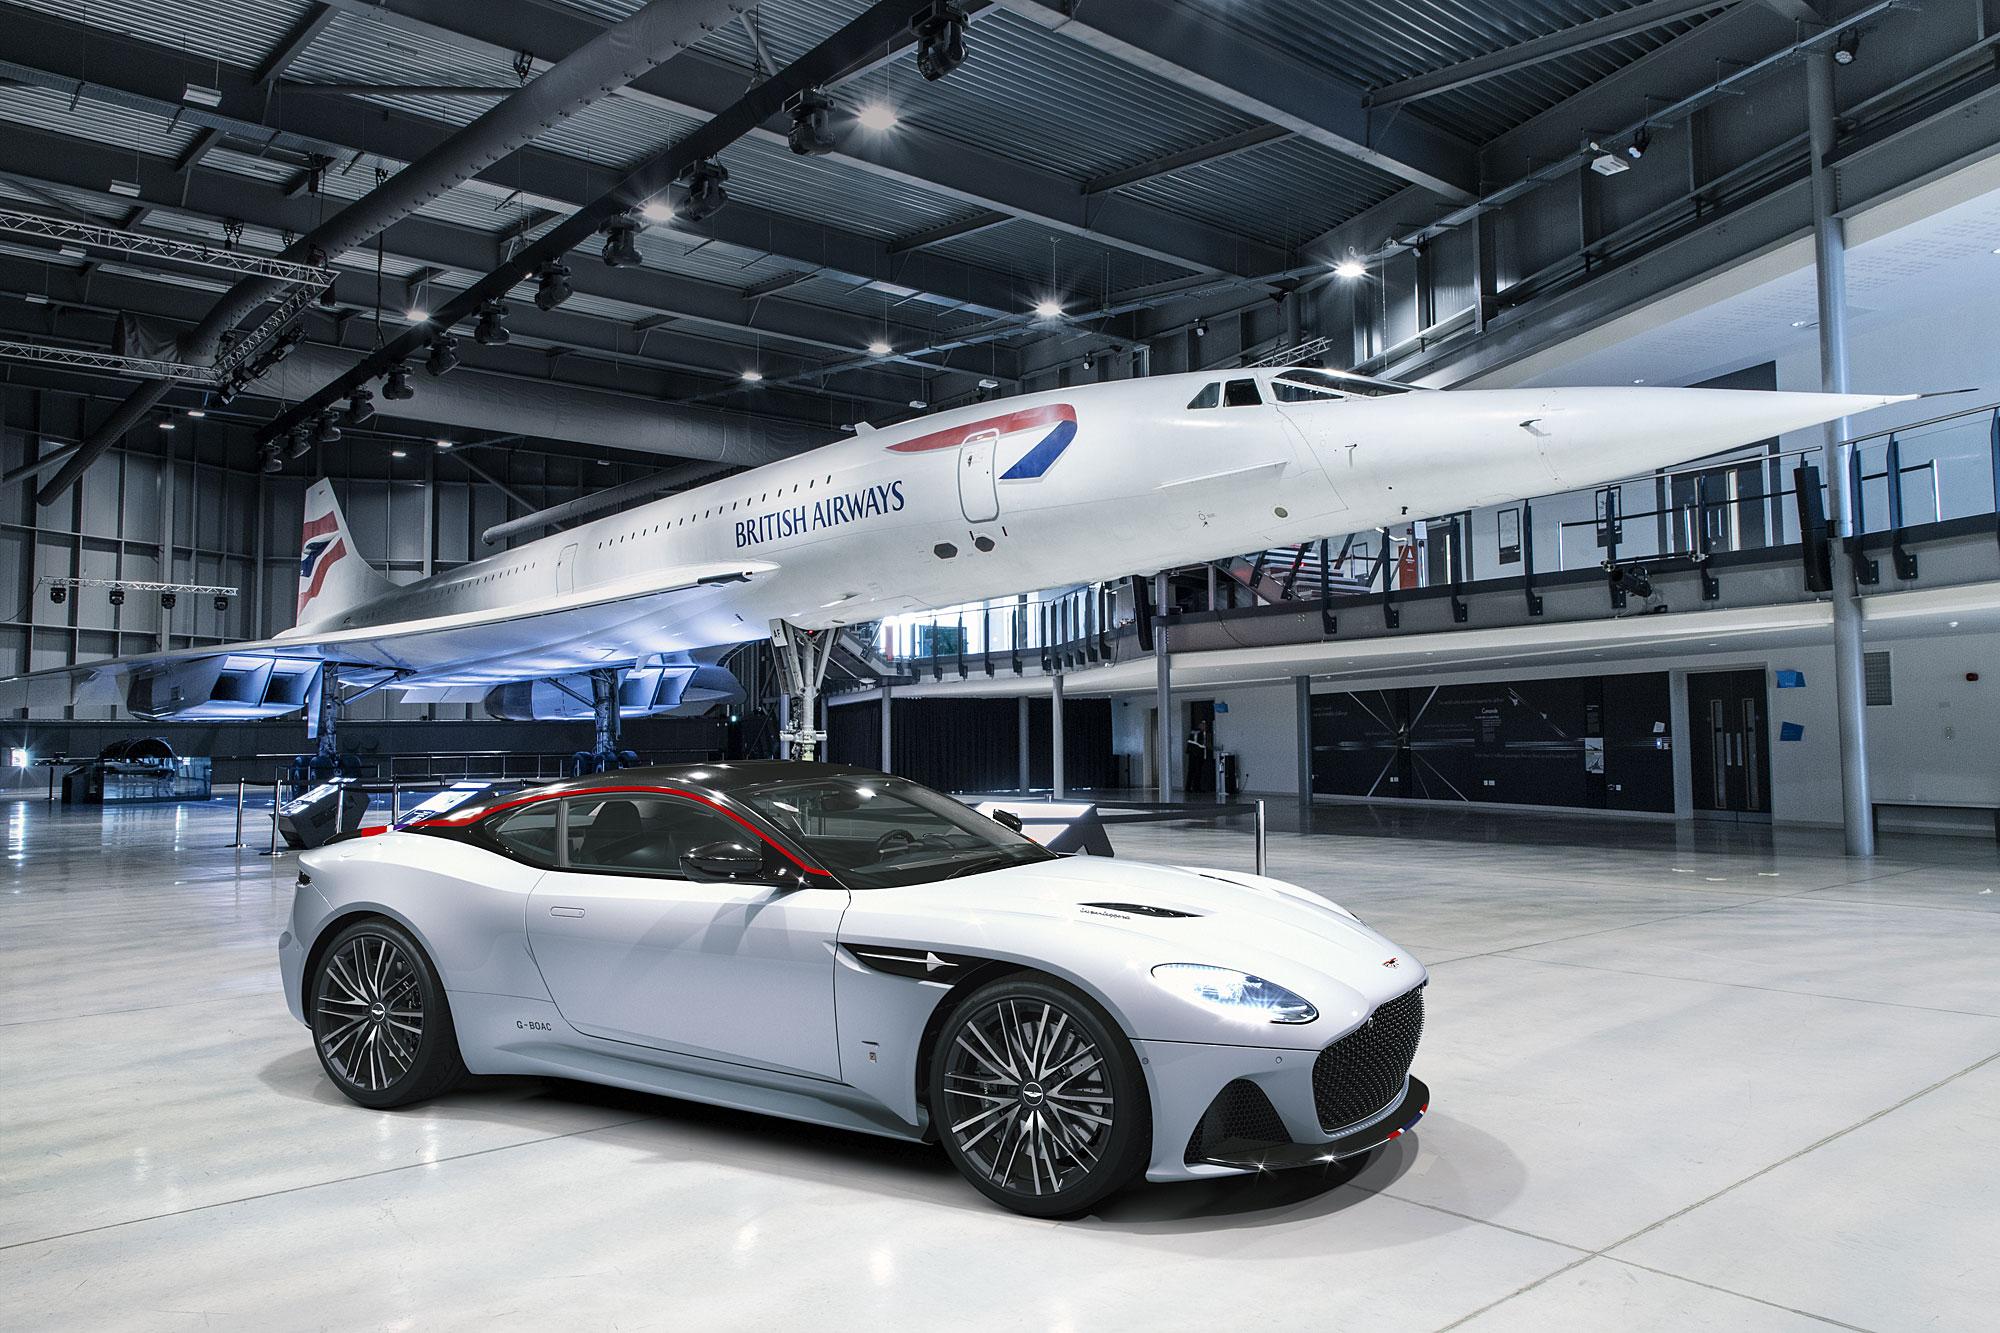 DBS Superleggera Concorde 大量導入英國航空旗下協和號客機的相關元素。